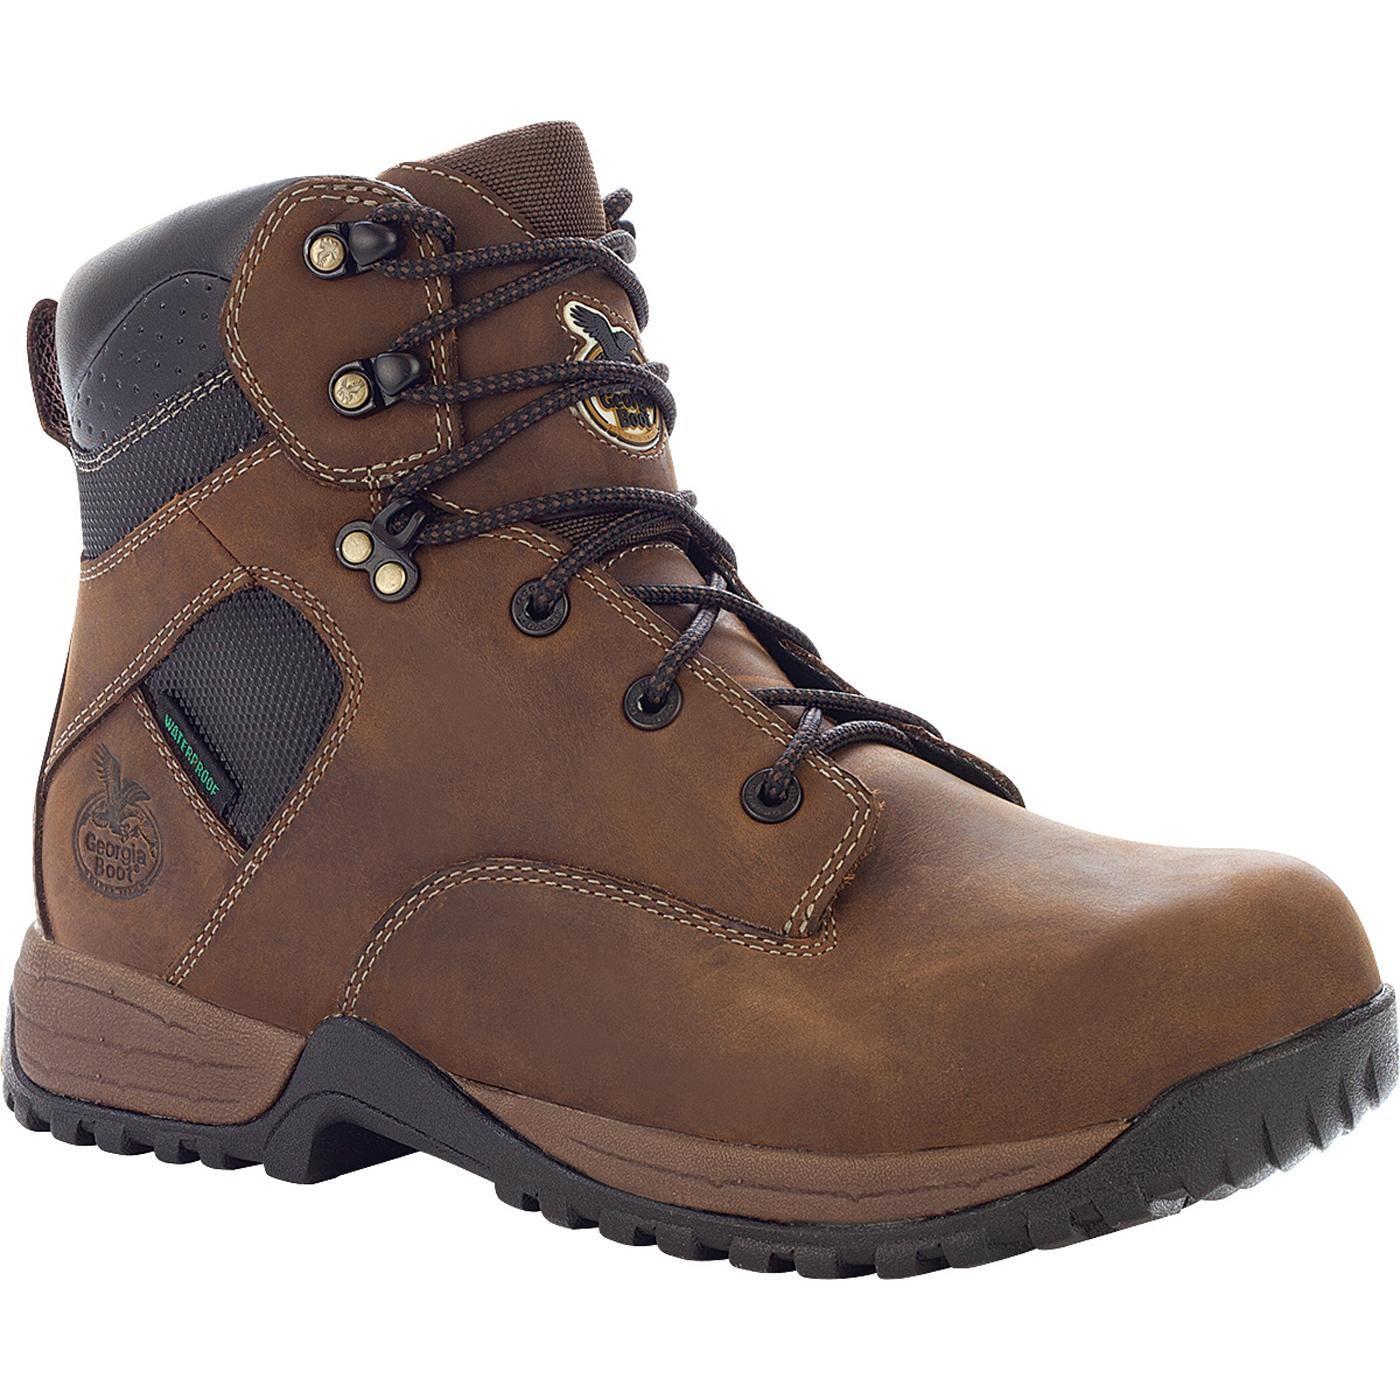 77df4814259 Georgia Boot: Men's Waterproof Hiker Work Shoe - Riverdale ...